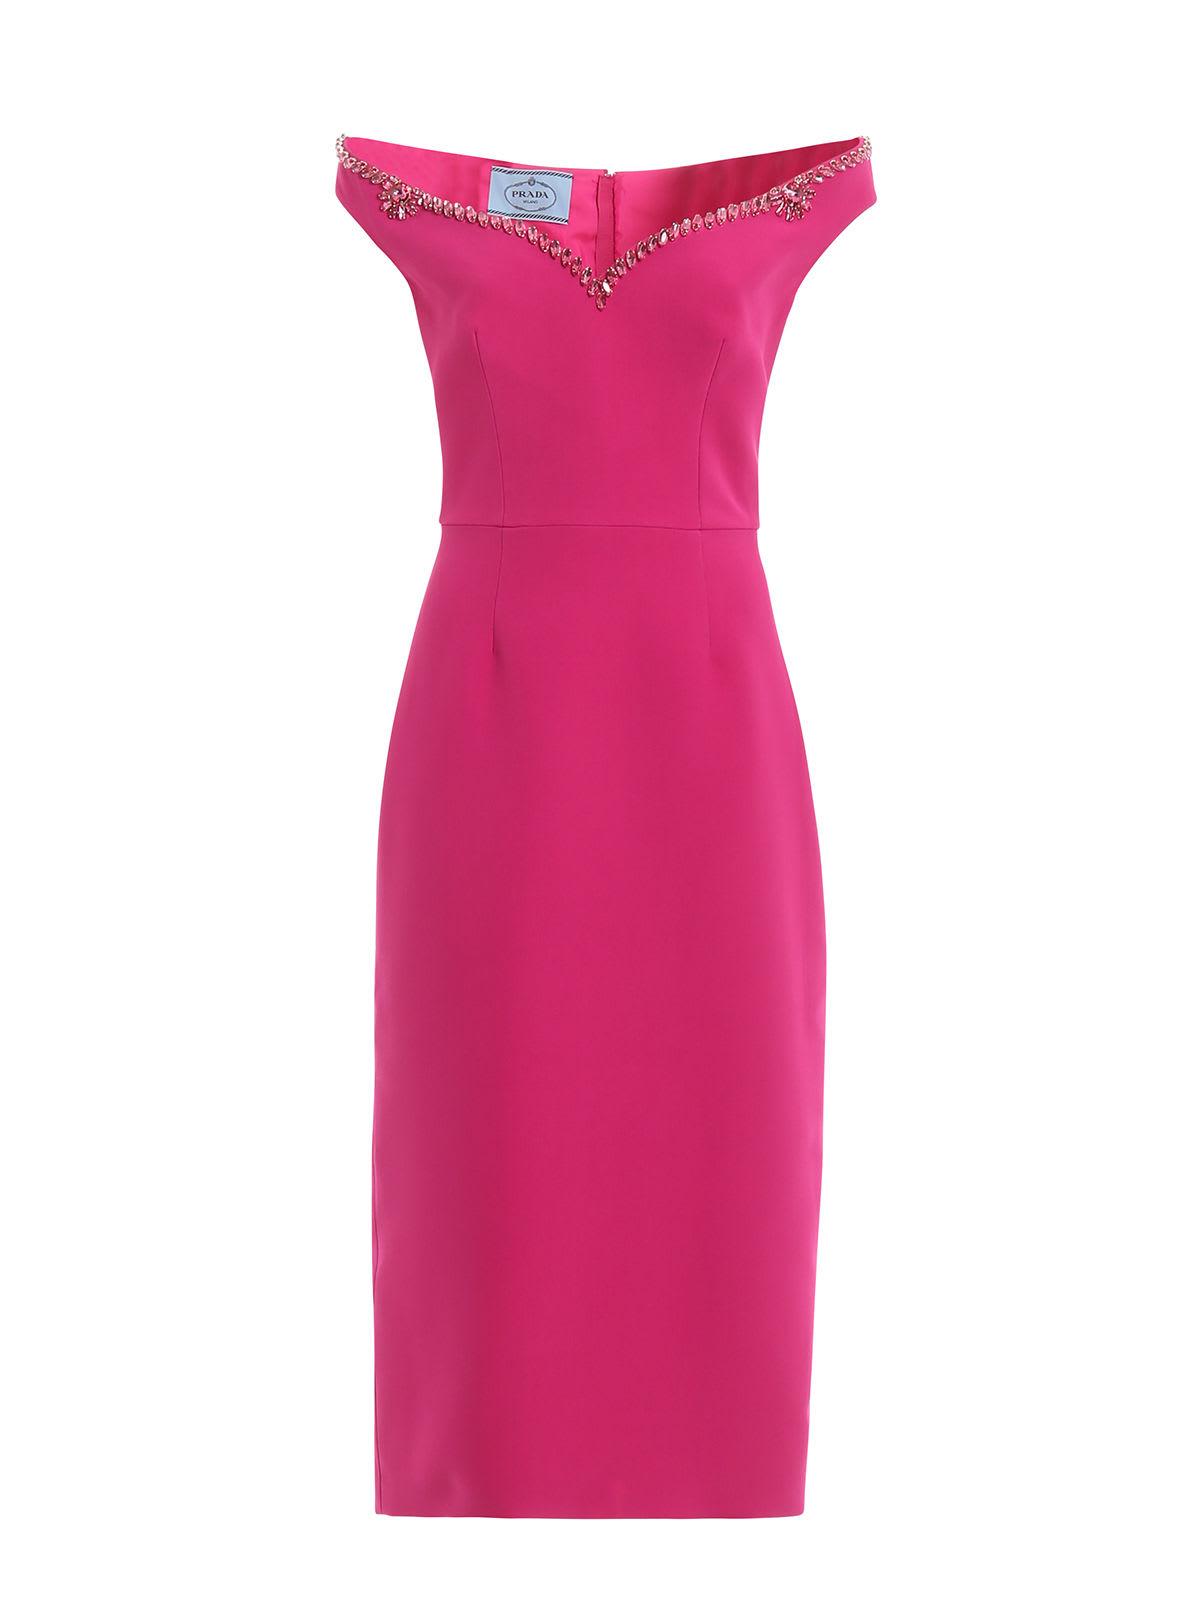 Prada Dress Cady